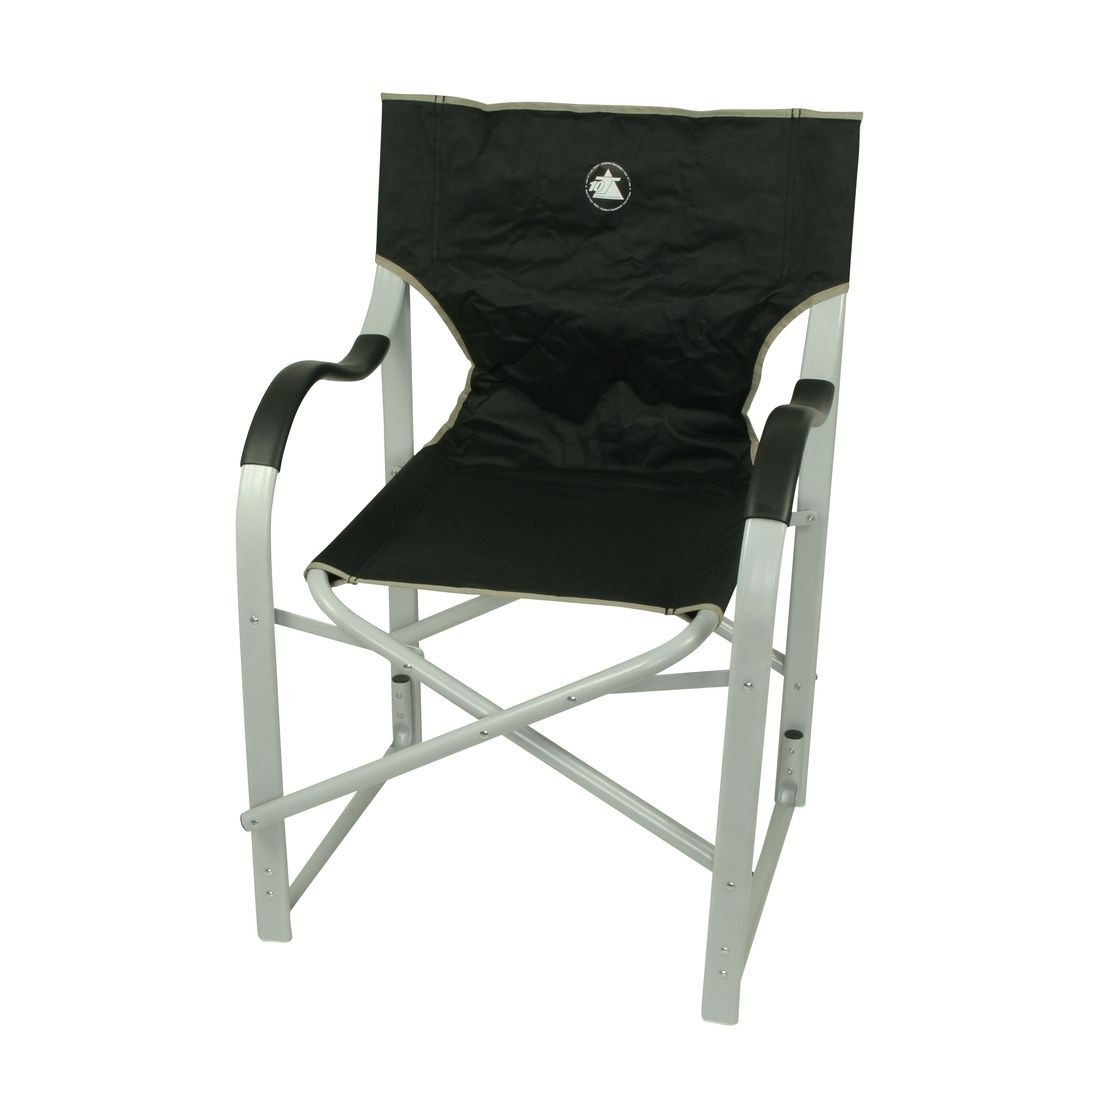 10t Alloydirector Aluminium Camping Chair Director 180 S